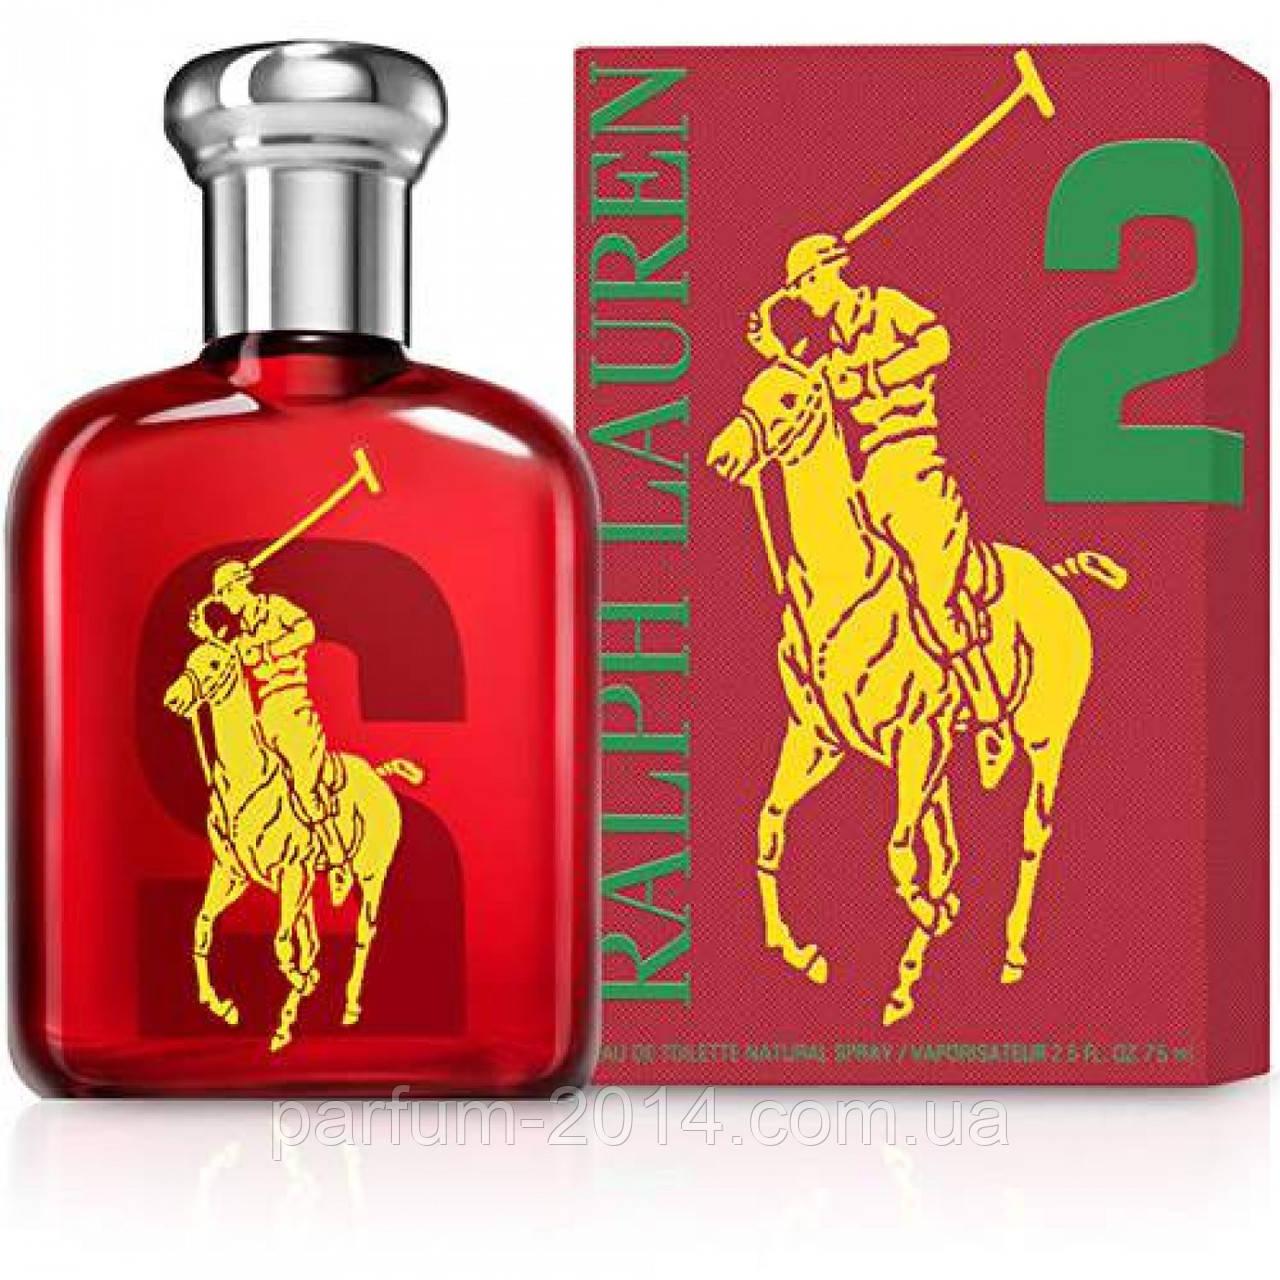 Мужская туалетная вода Ralph Lauren polo pony 2 red (реплика)